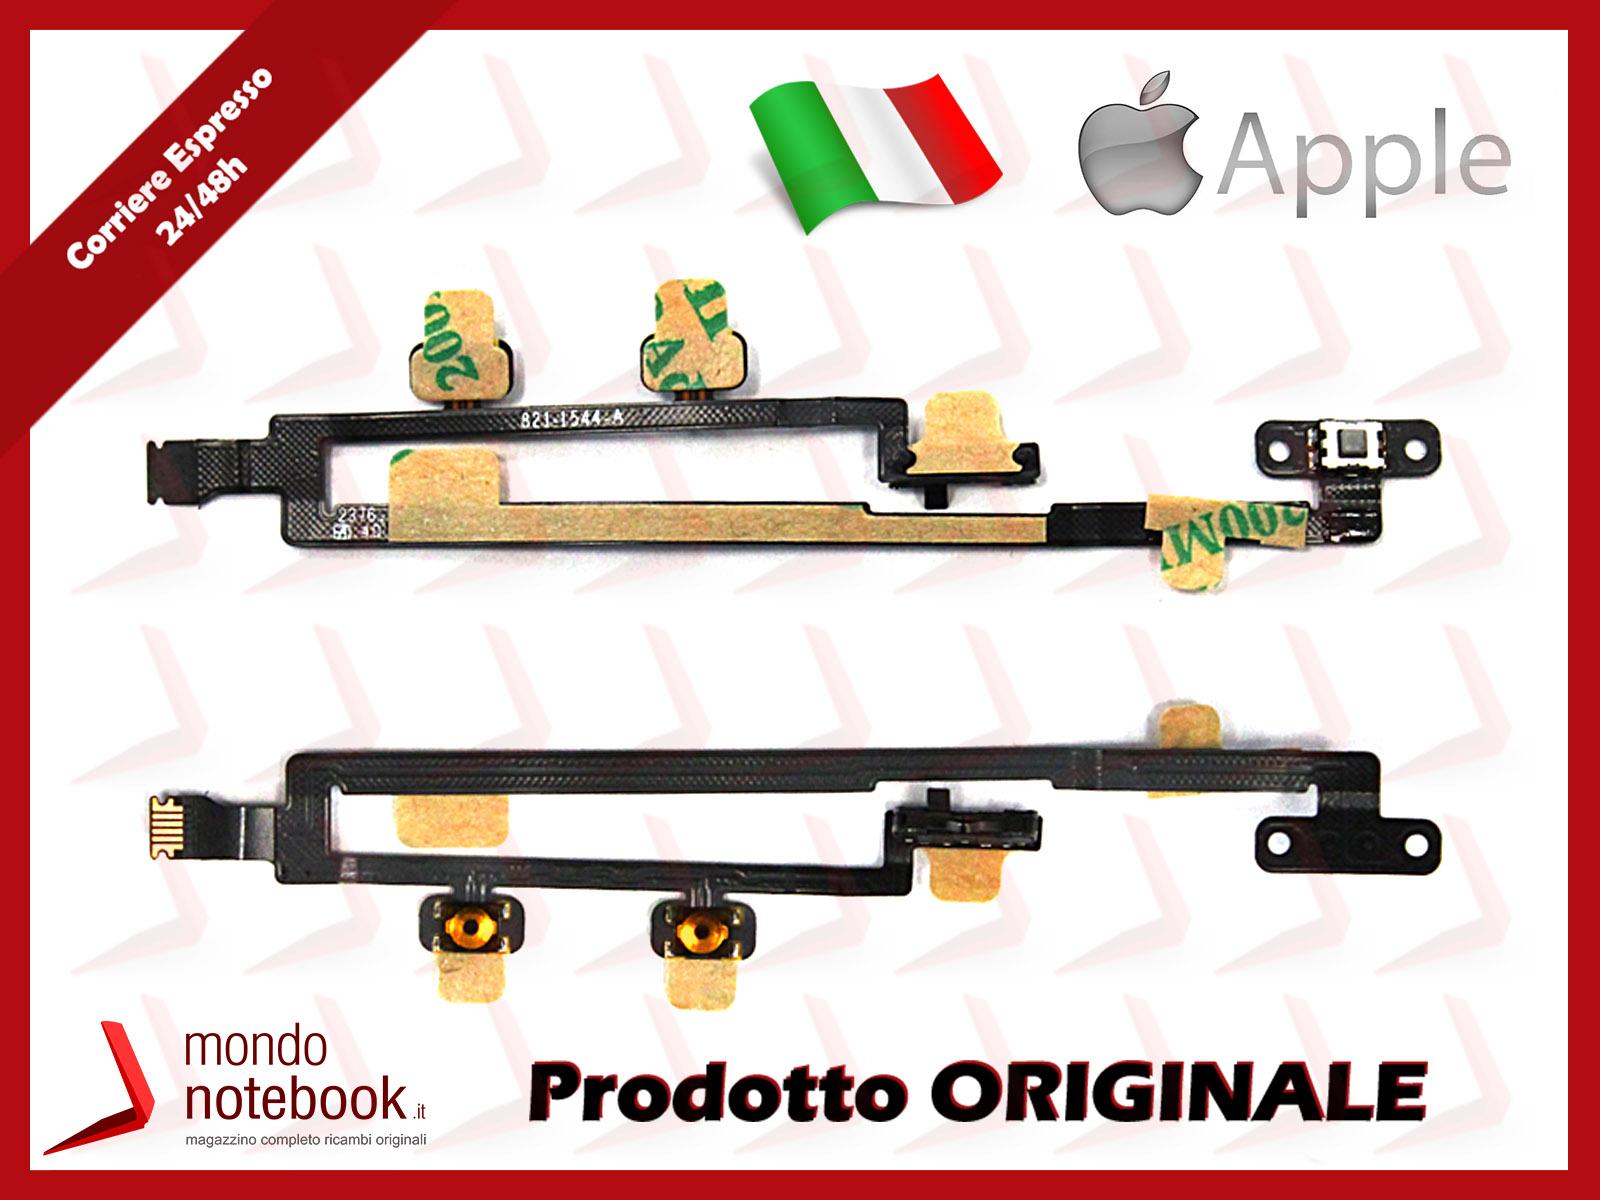 https://www.mondonotebook.it/2409/tasto-accensione-apple-ipad-mini-power-flex-cable-cavo-flat.jpg